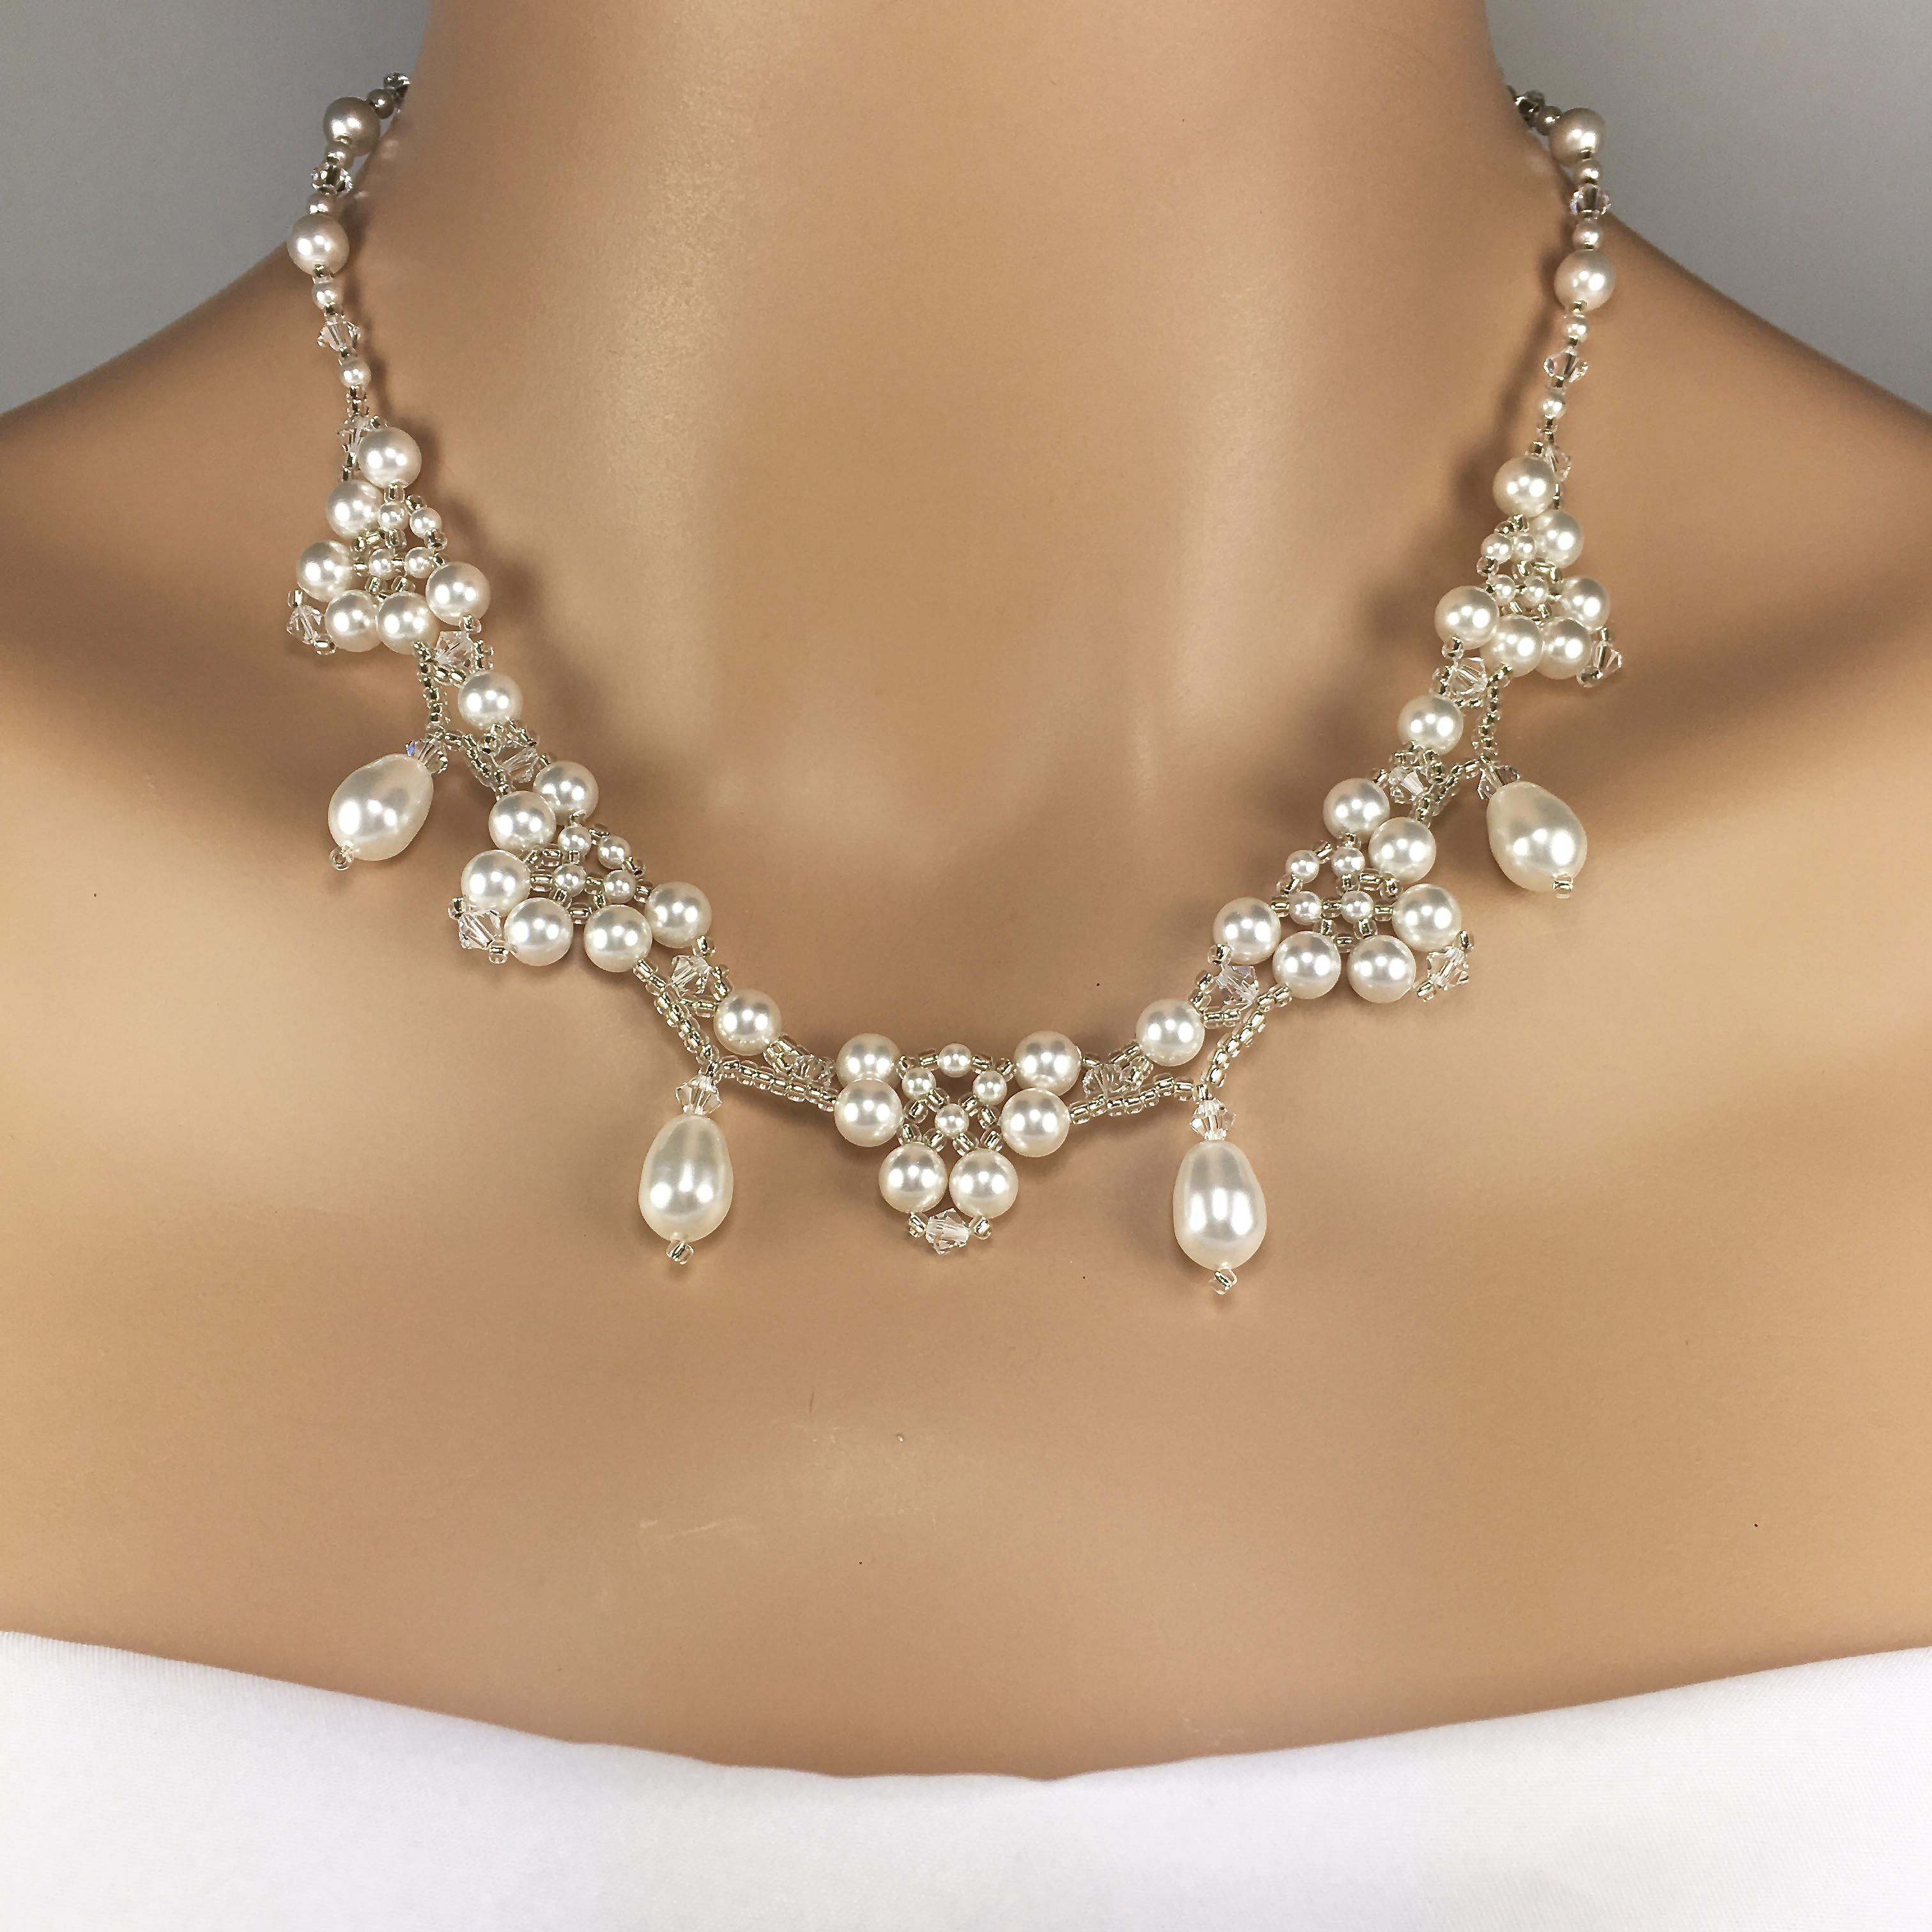 Vintage Style Pearl Bridal Jewelry